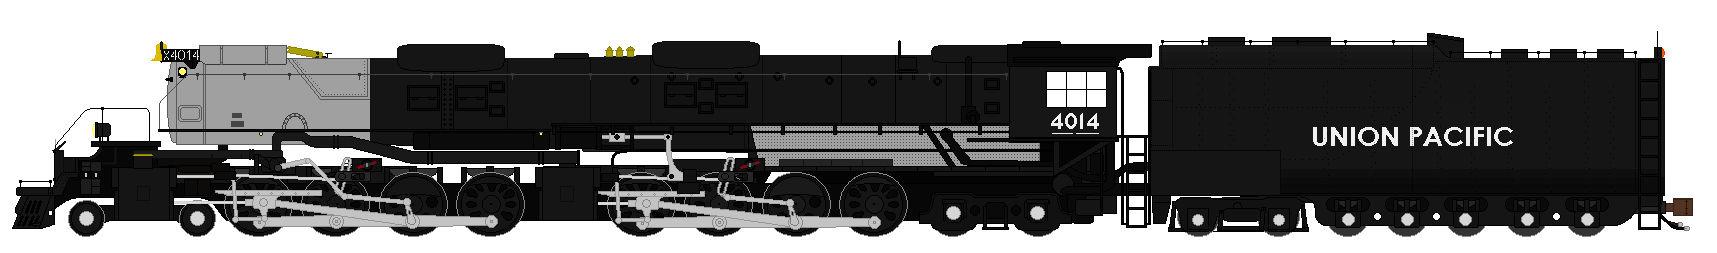 Union Pacific Big Boy 4014